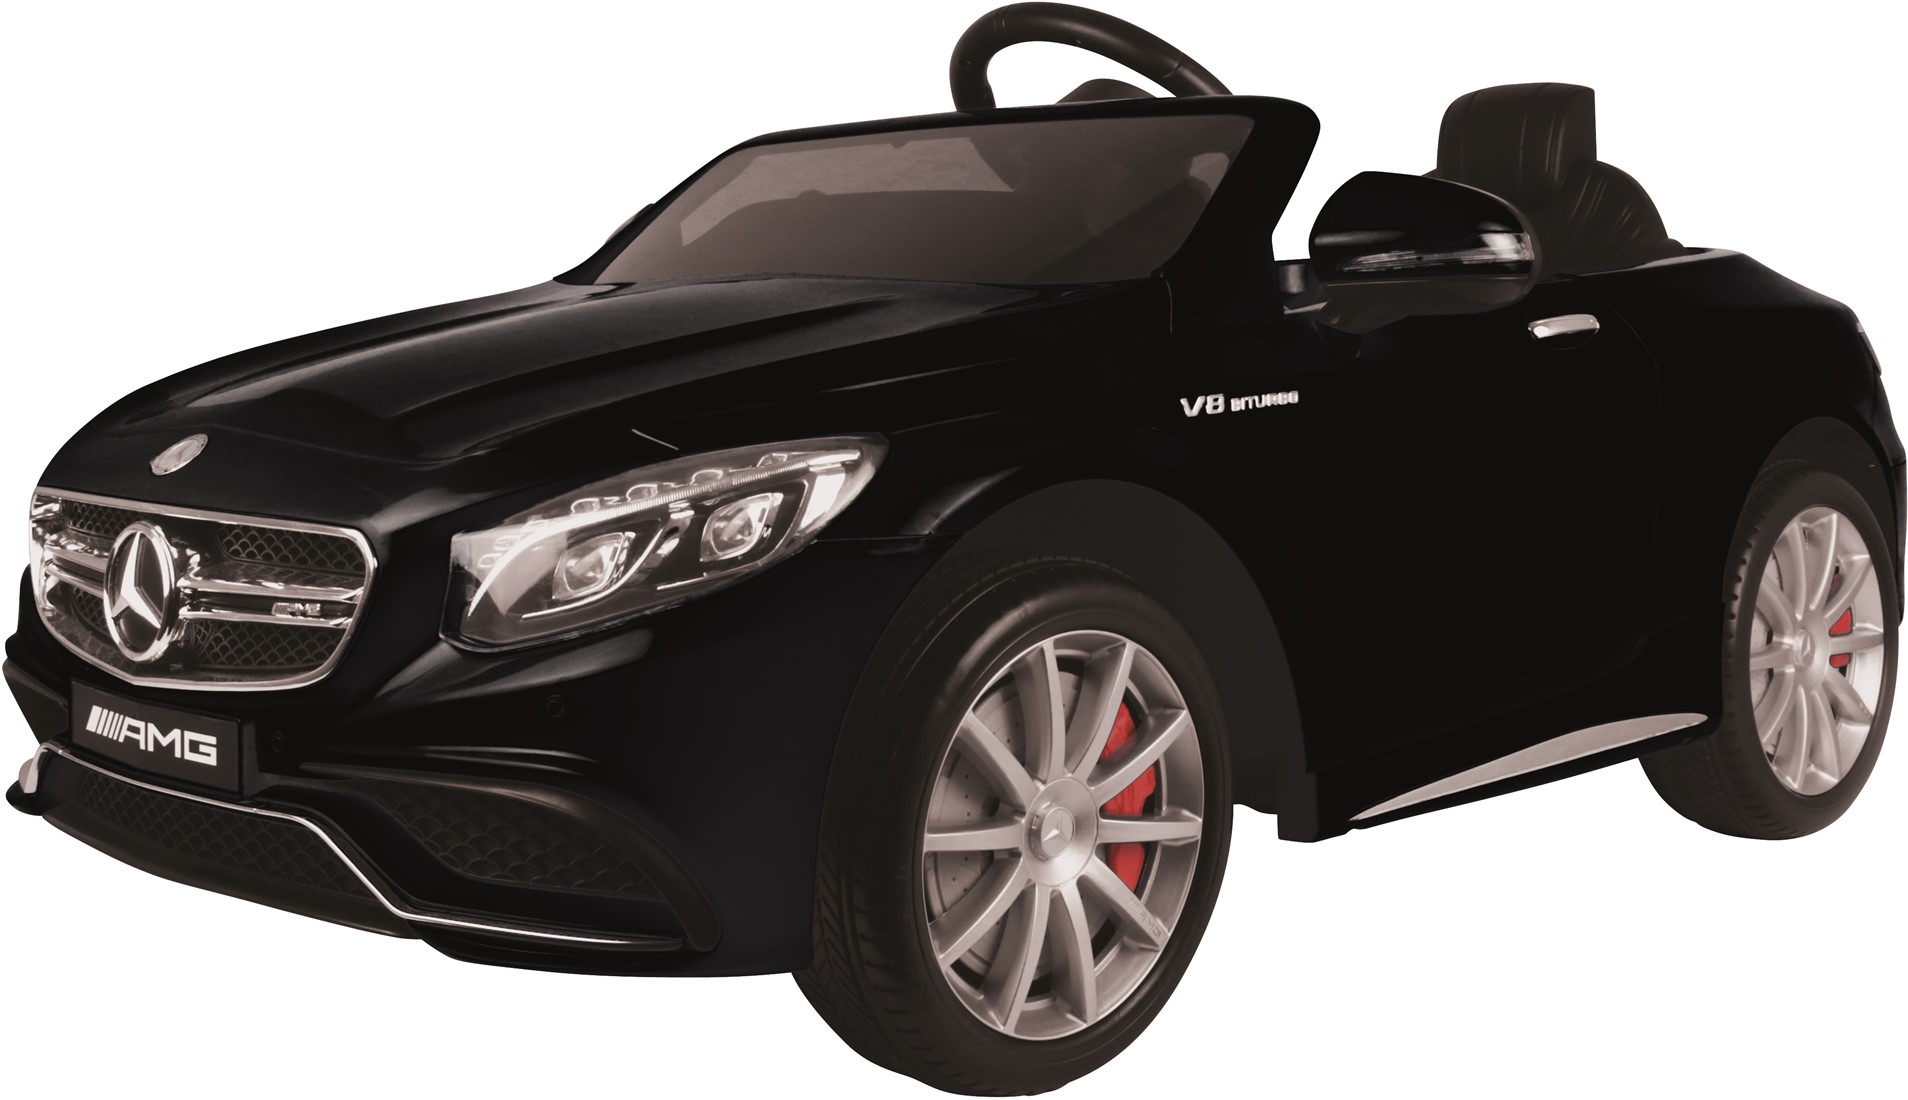 Afbeelding van E car mercedes benz s63 amg zwart